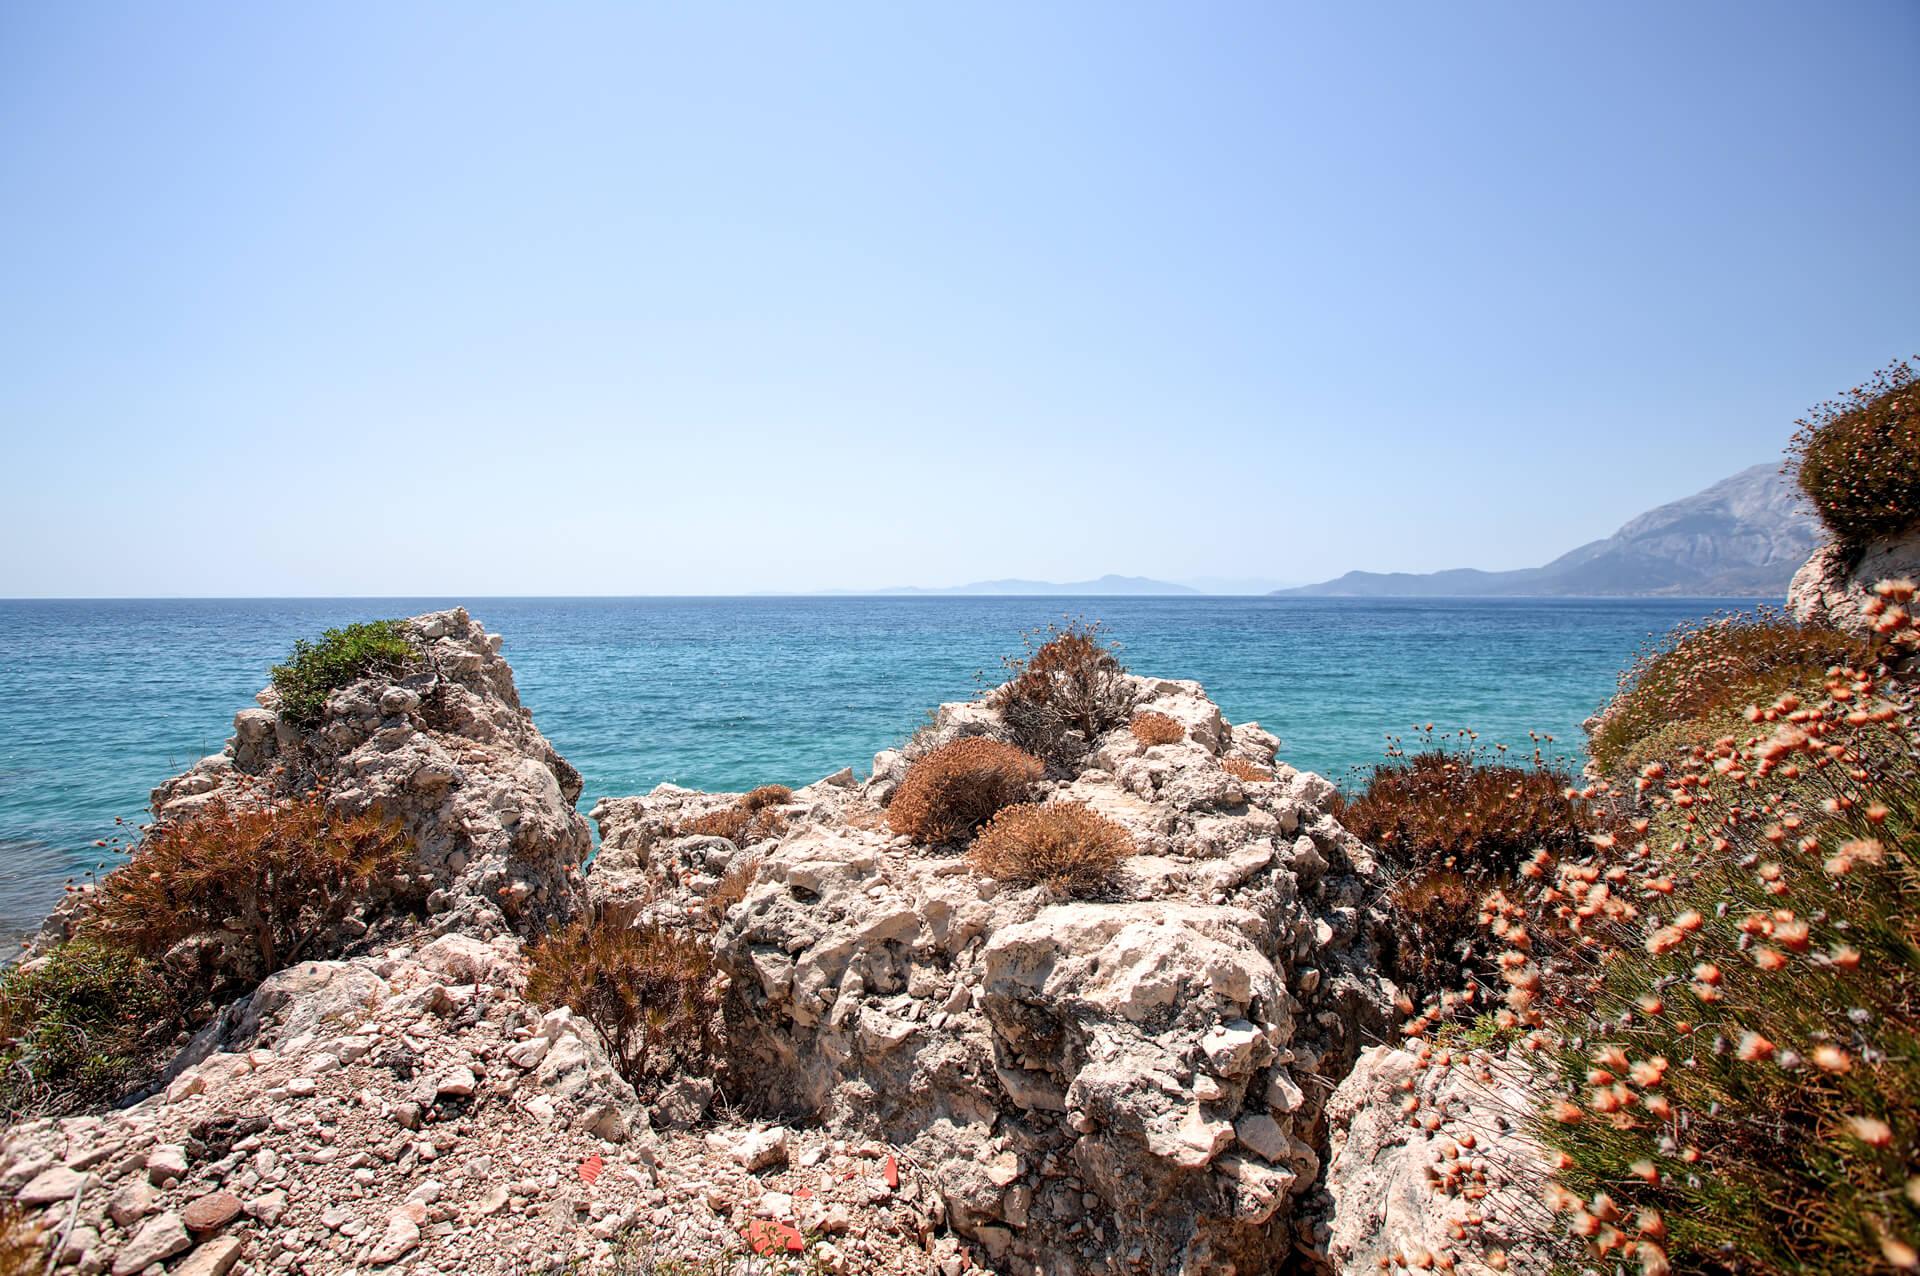 mediterranean rocky coastline   hire a photographer